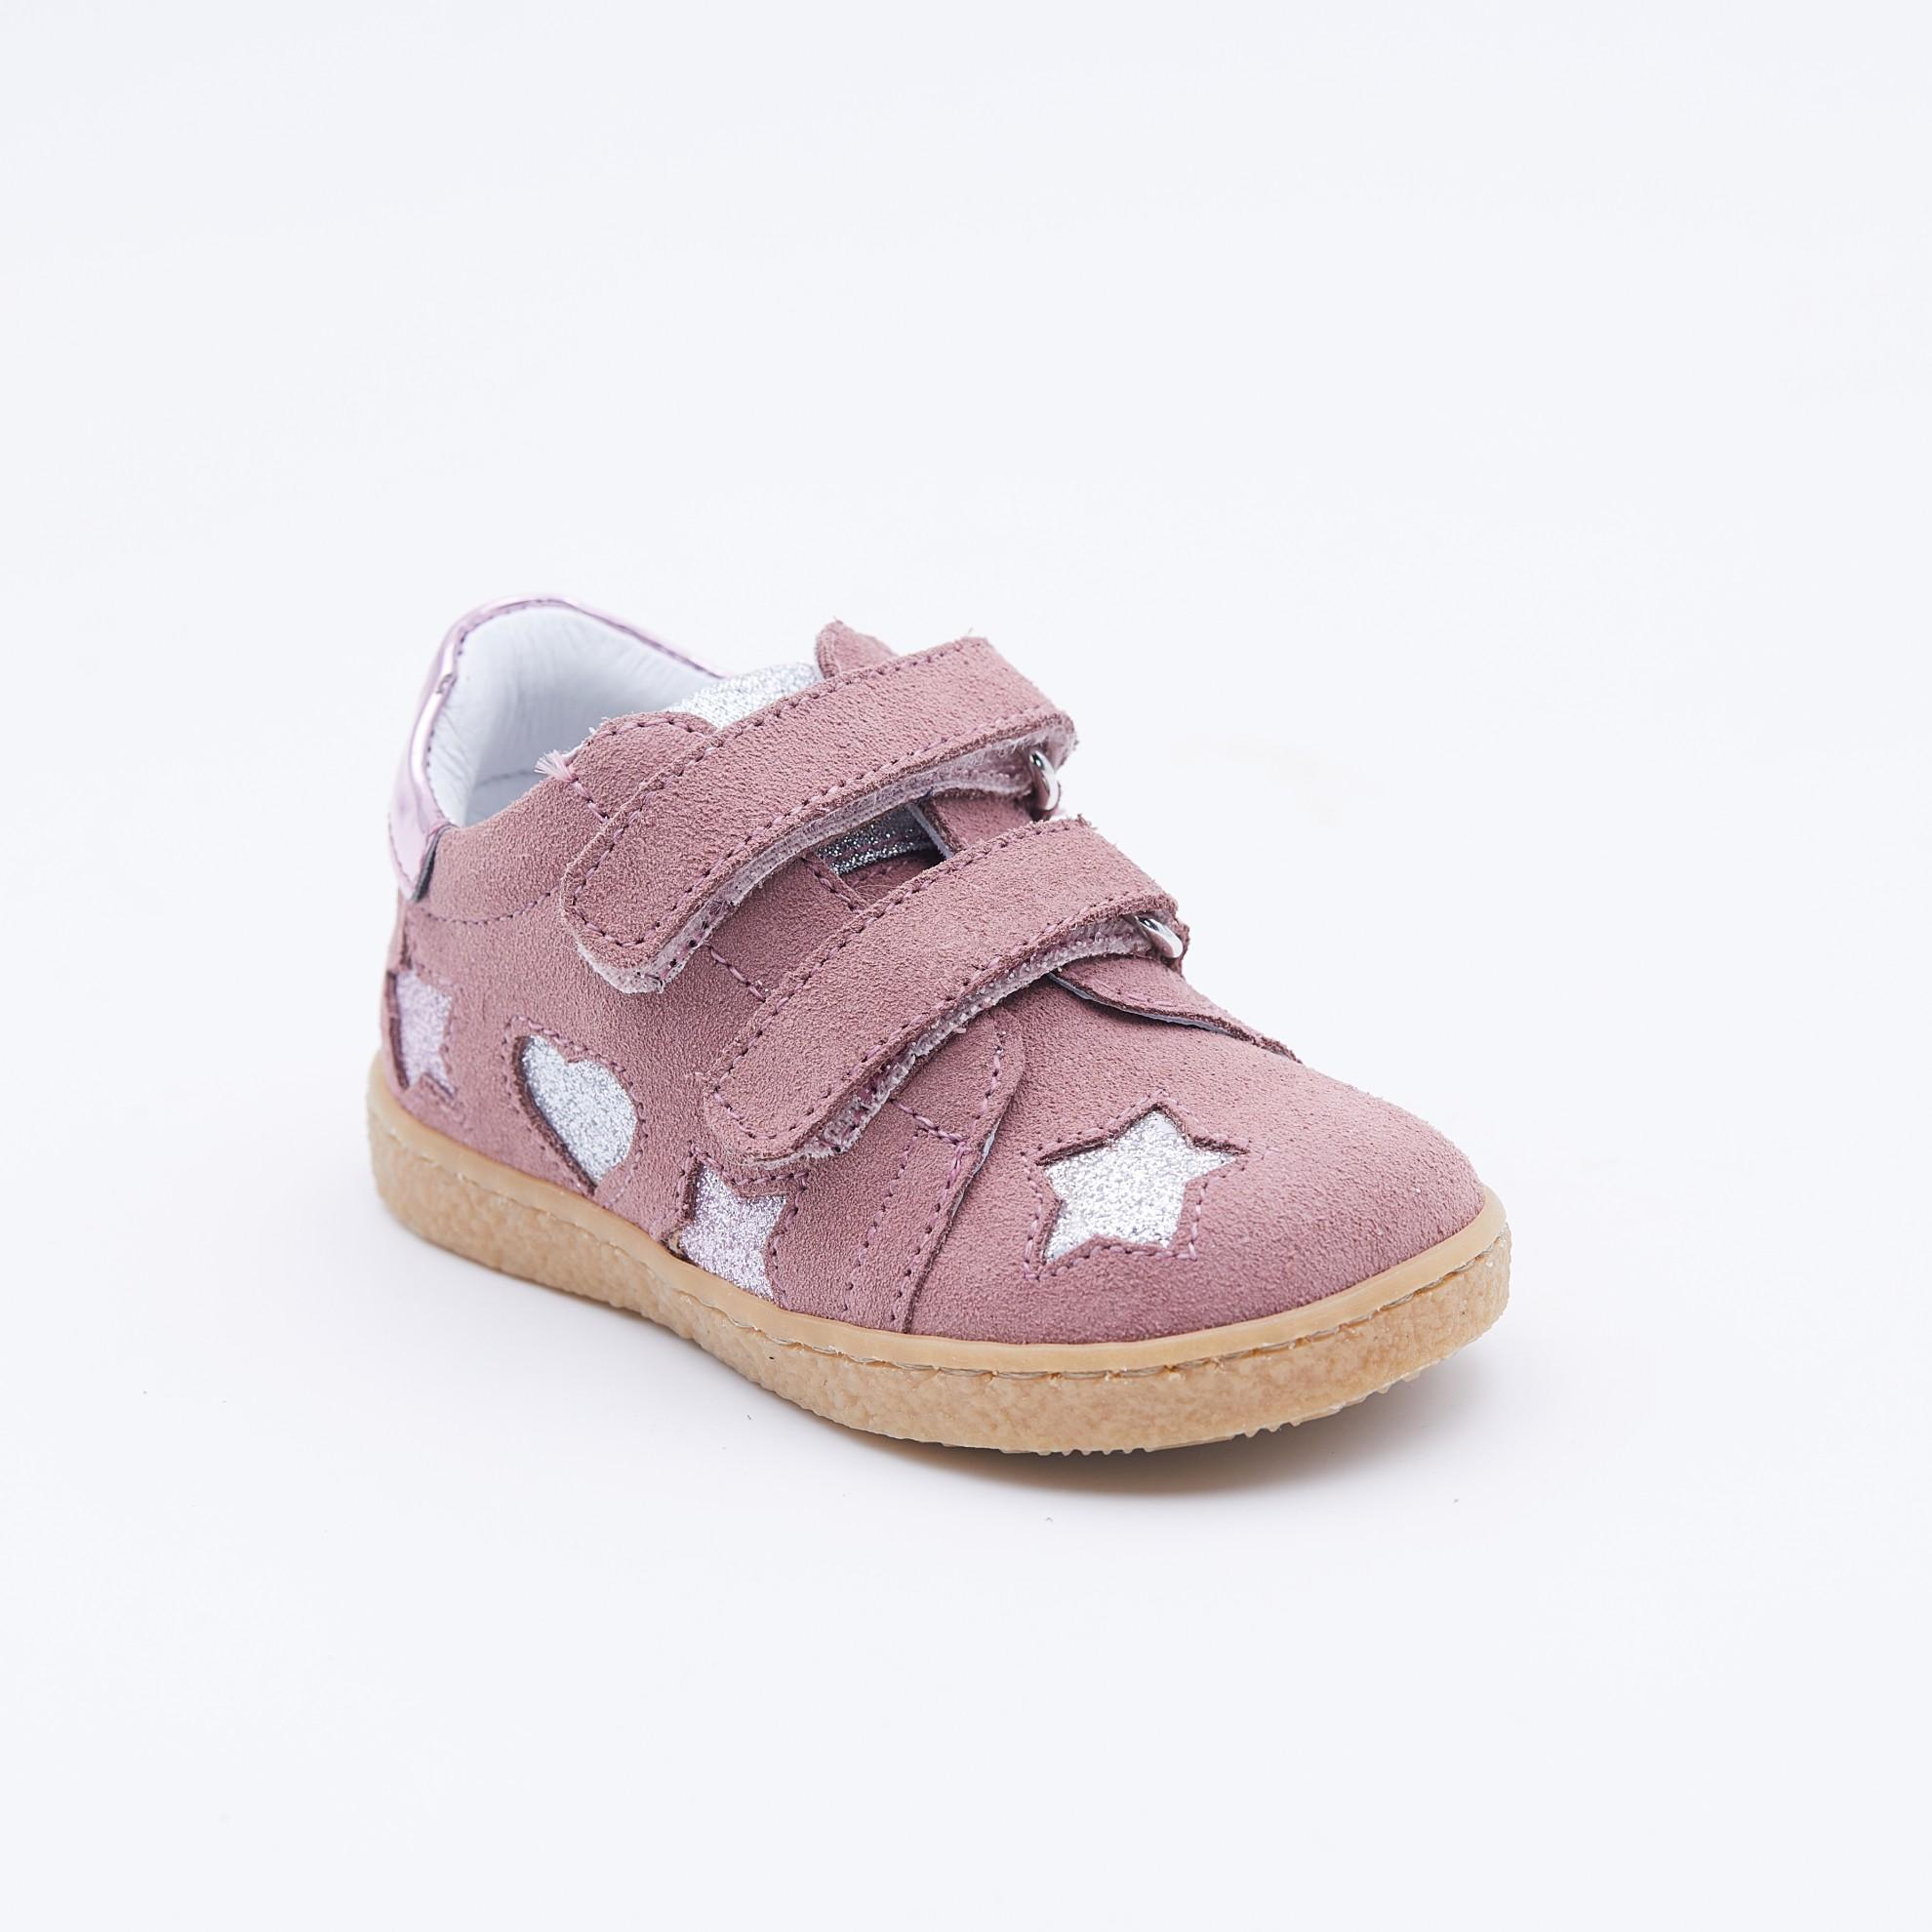 Pantofi roz inchis piele intoarsa